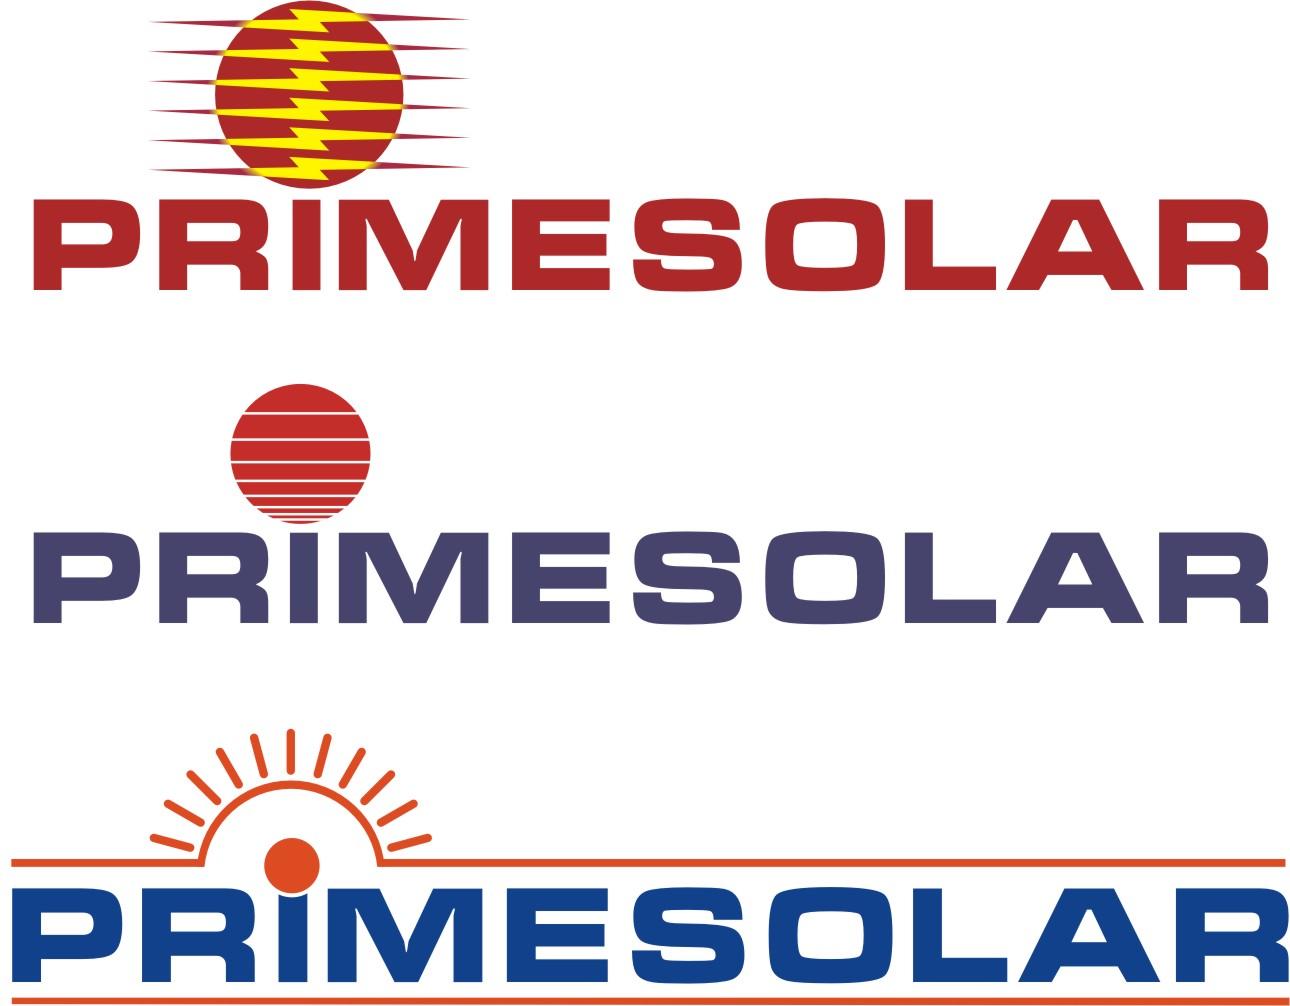 Логотип компании PrimeSolar [UPD: 16:45 15/12/11] фото f_4eee1eb3149e0.jpg